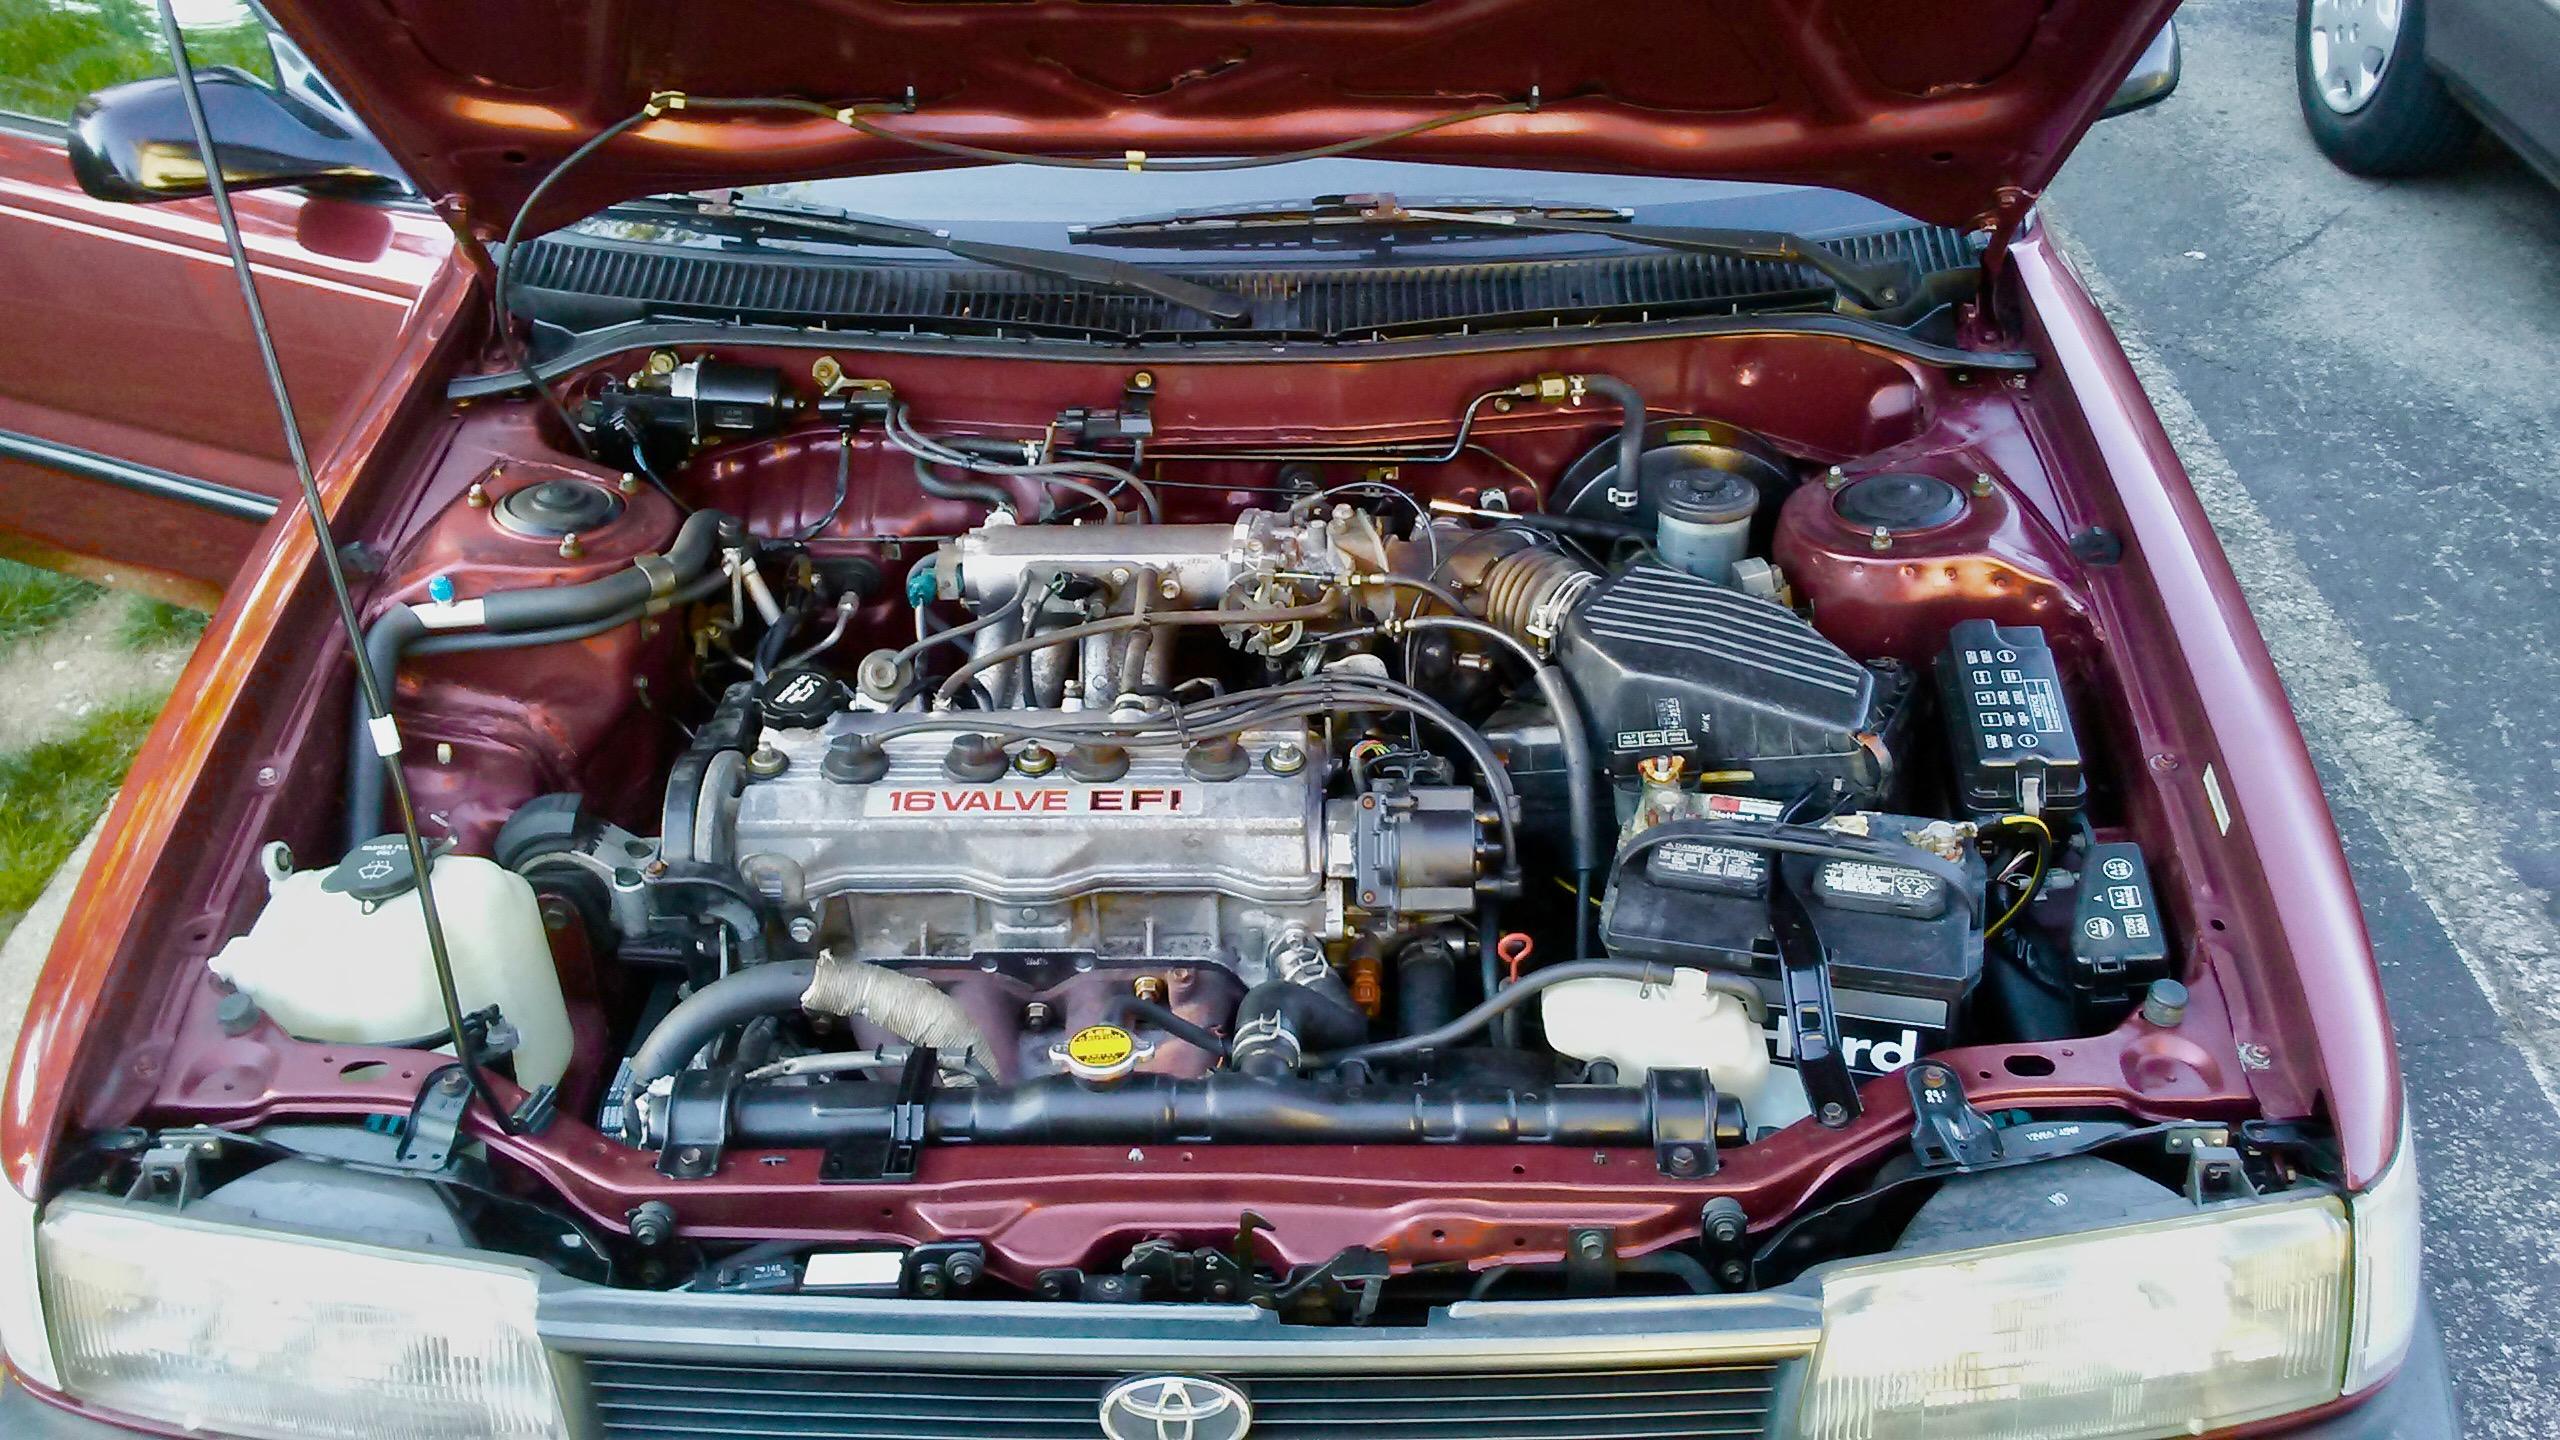 How to Adjust Car Valves (Part 3)